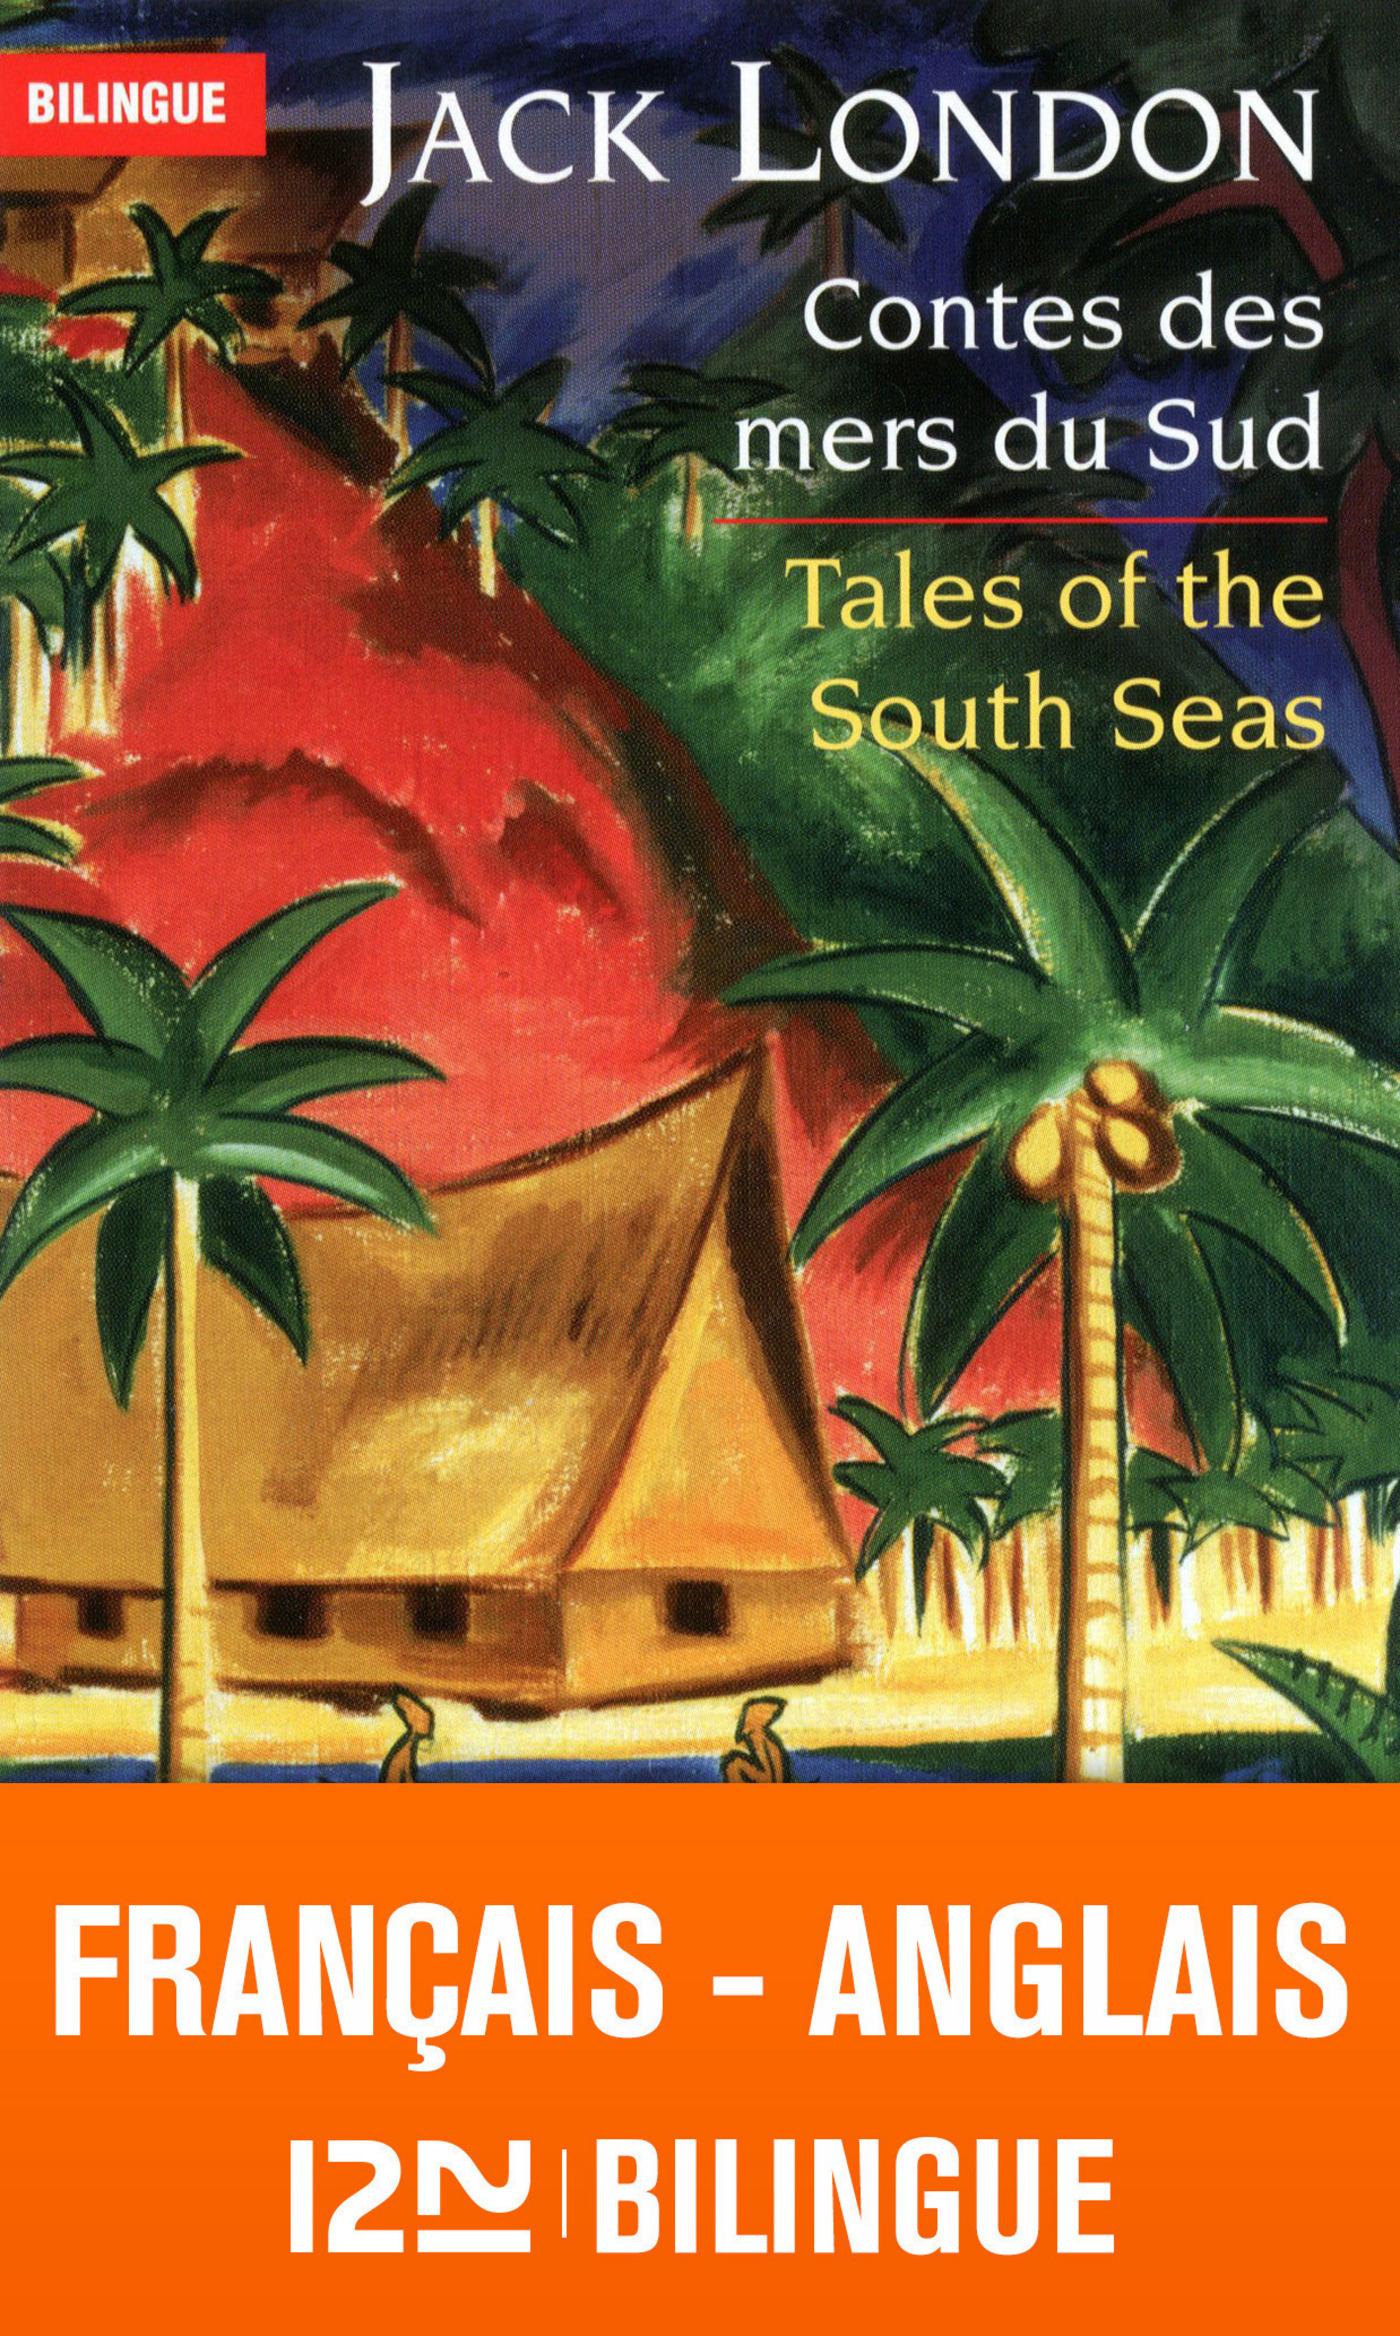 Bilingue français-anglais : Contes des mers du sud - Tales of the South Seas